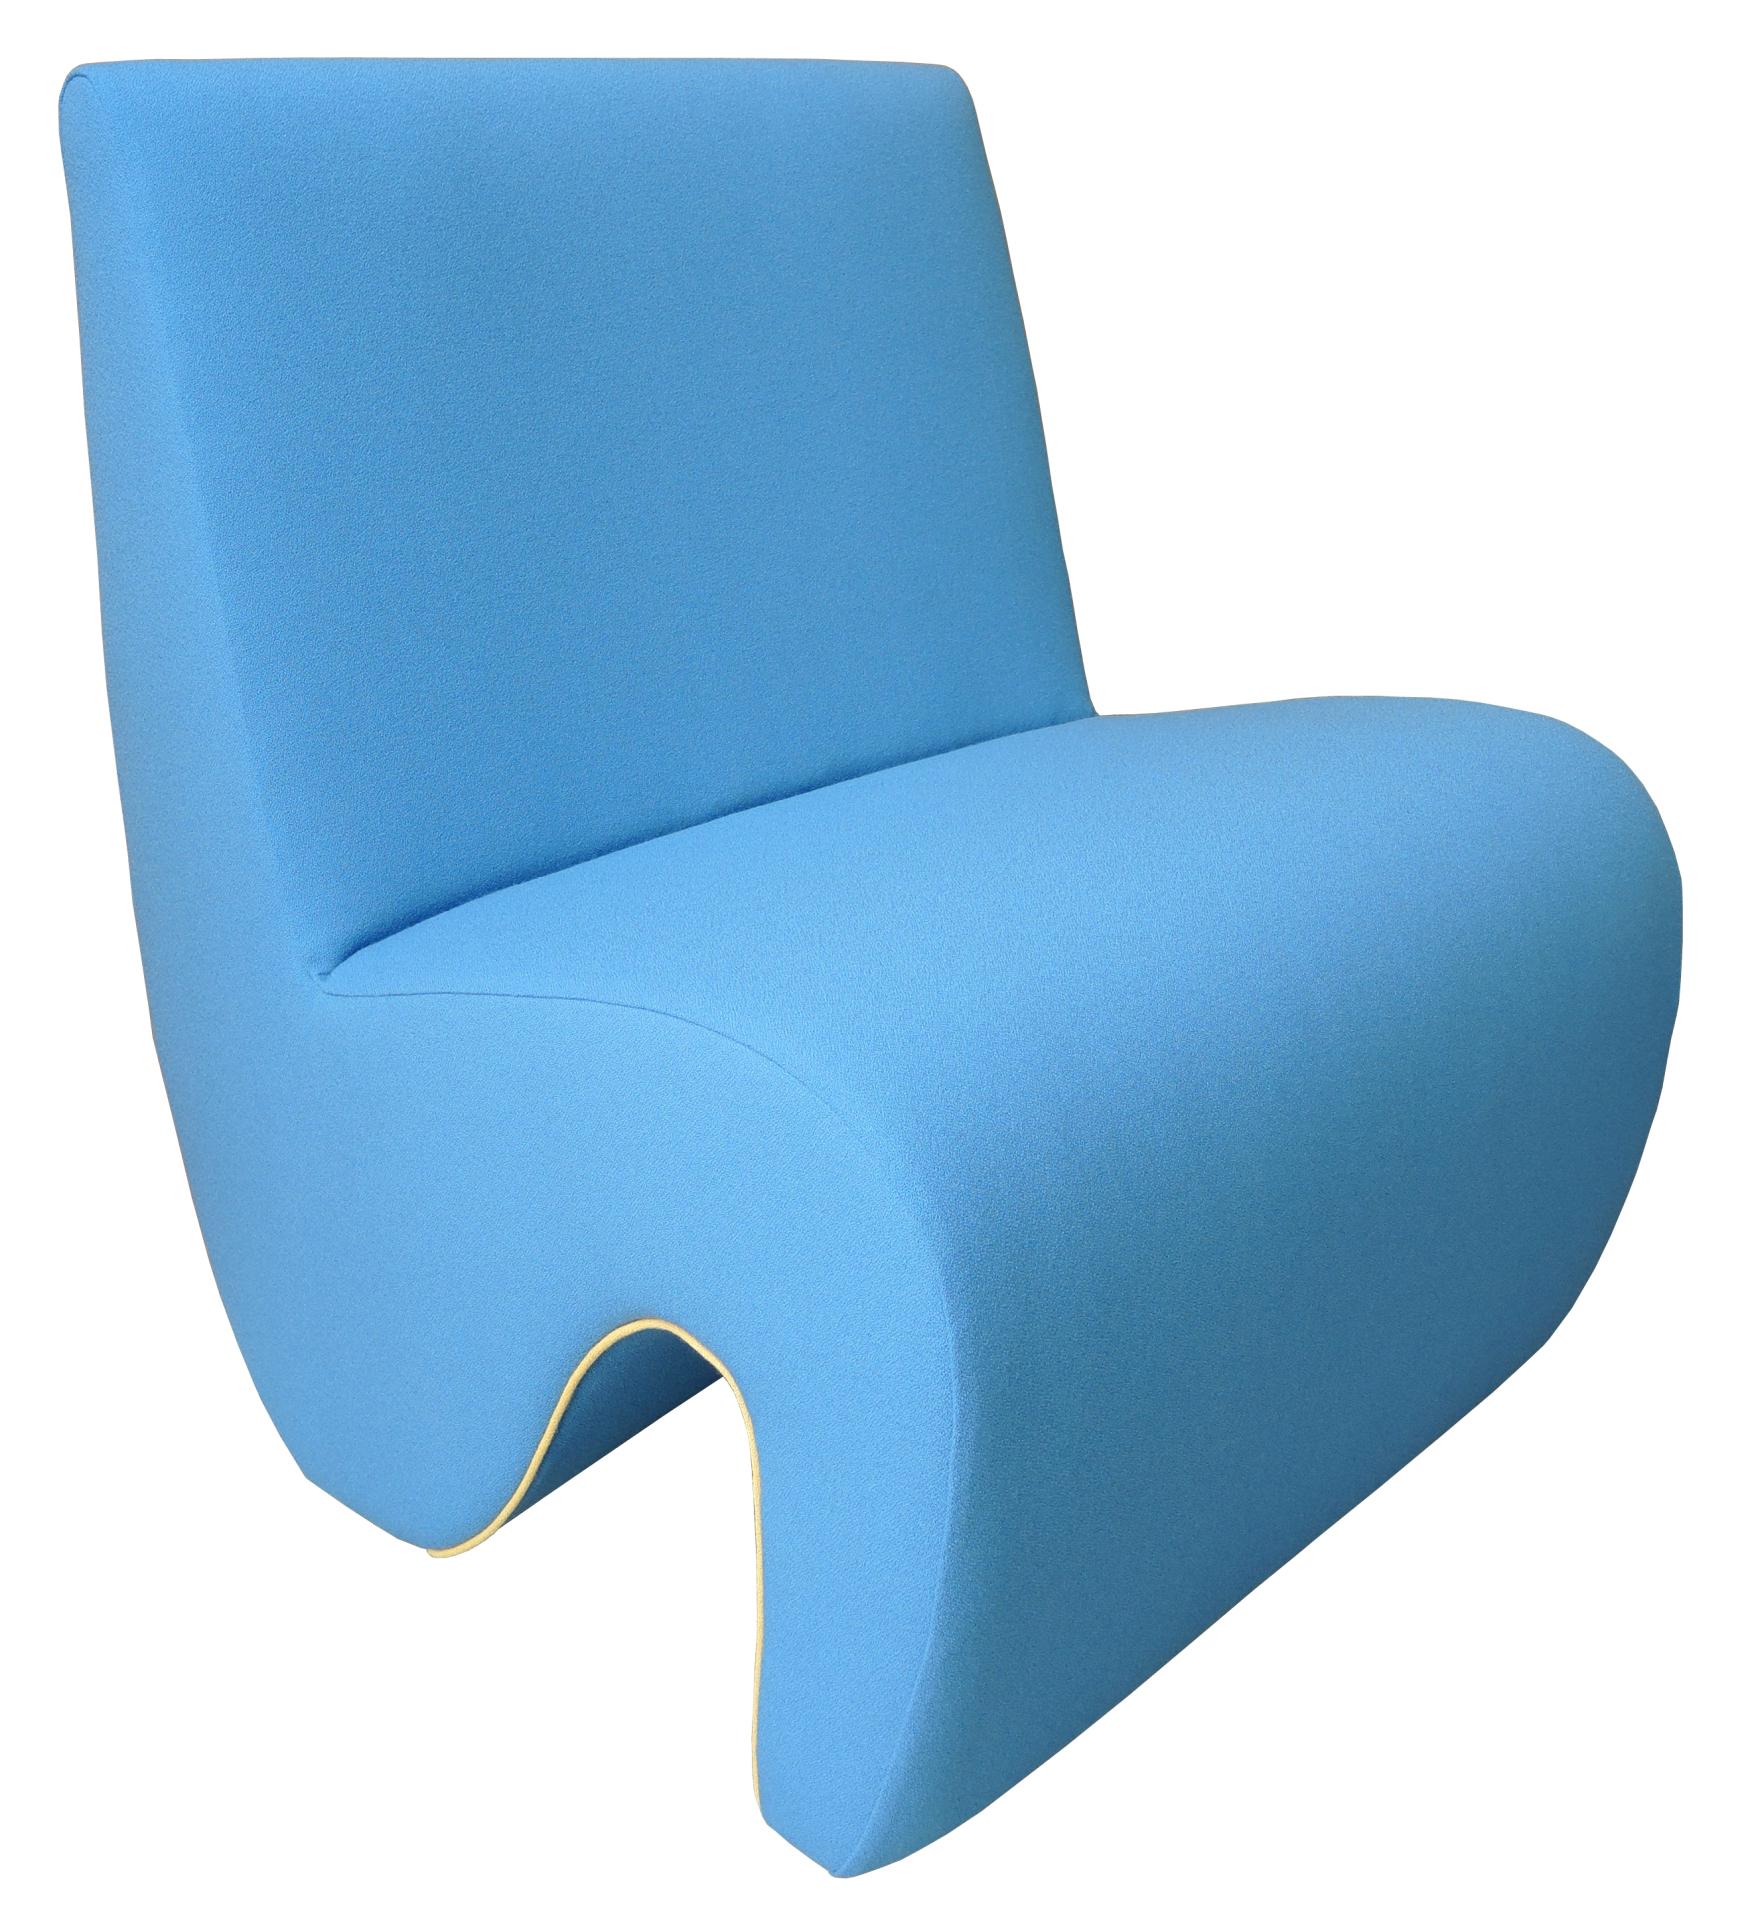 Direct Ergonomics | Sydney Office Furniture | Ergonomic Furniture | Collaborative Seating | Waiting Lounges | Waiting Room Seating | Ergonomic Seating | Juniper